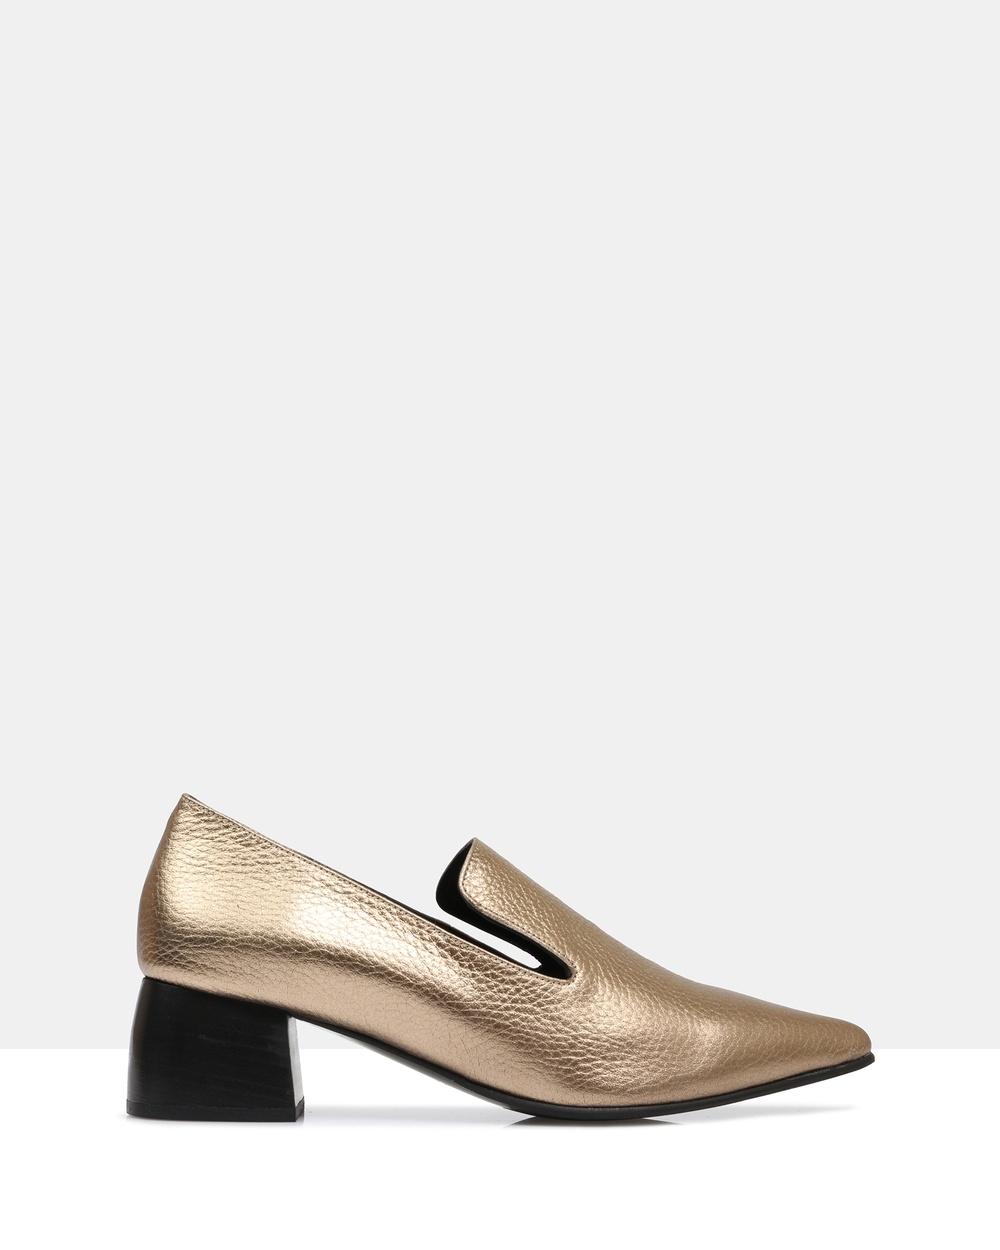 Sempre Di Petal Heeled Loafers Mid-low heels 992- 175 Copper Petal Heeled Loafers